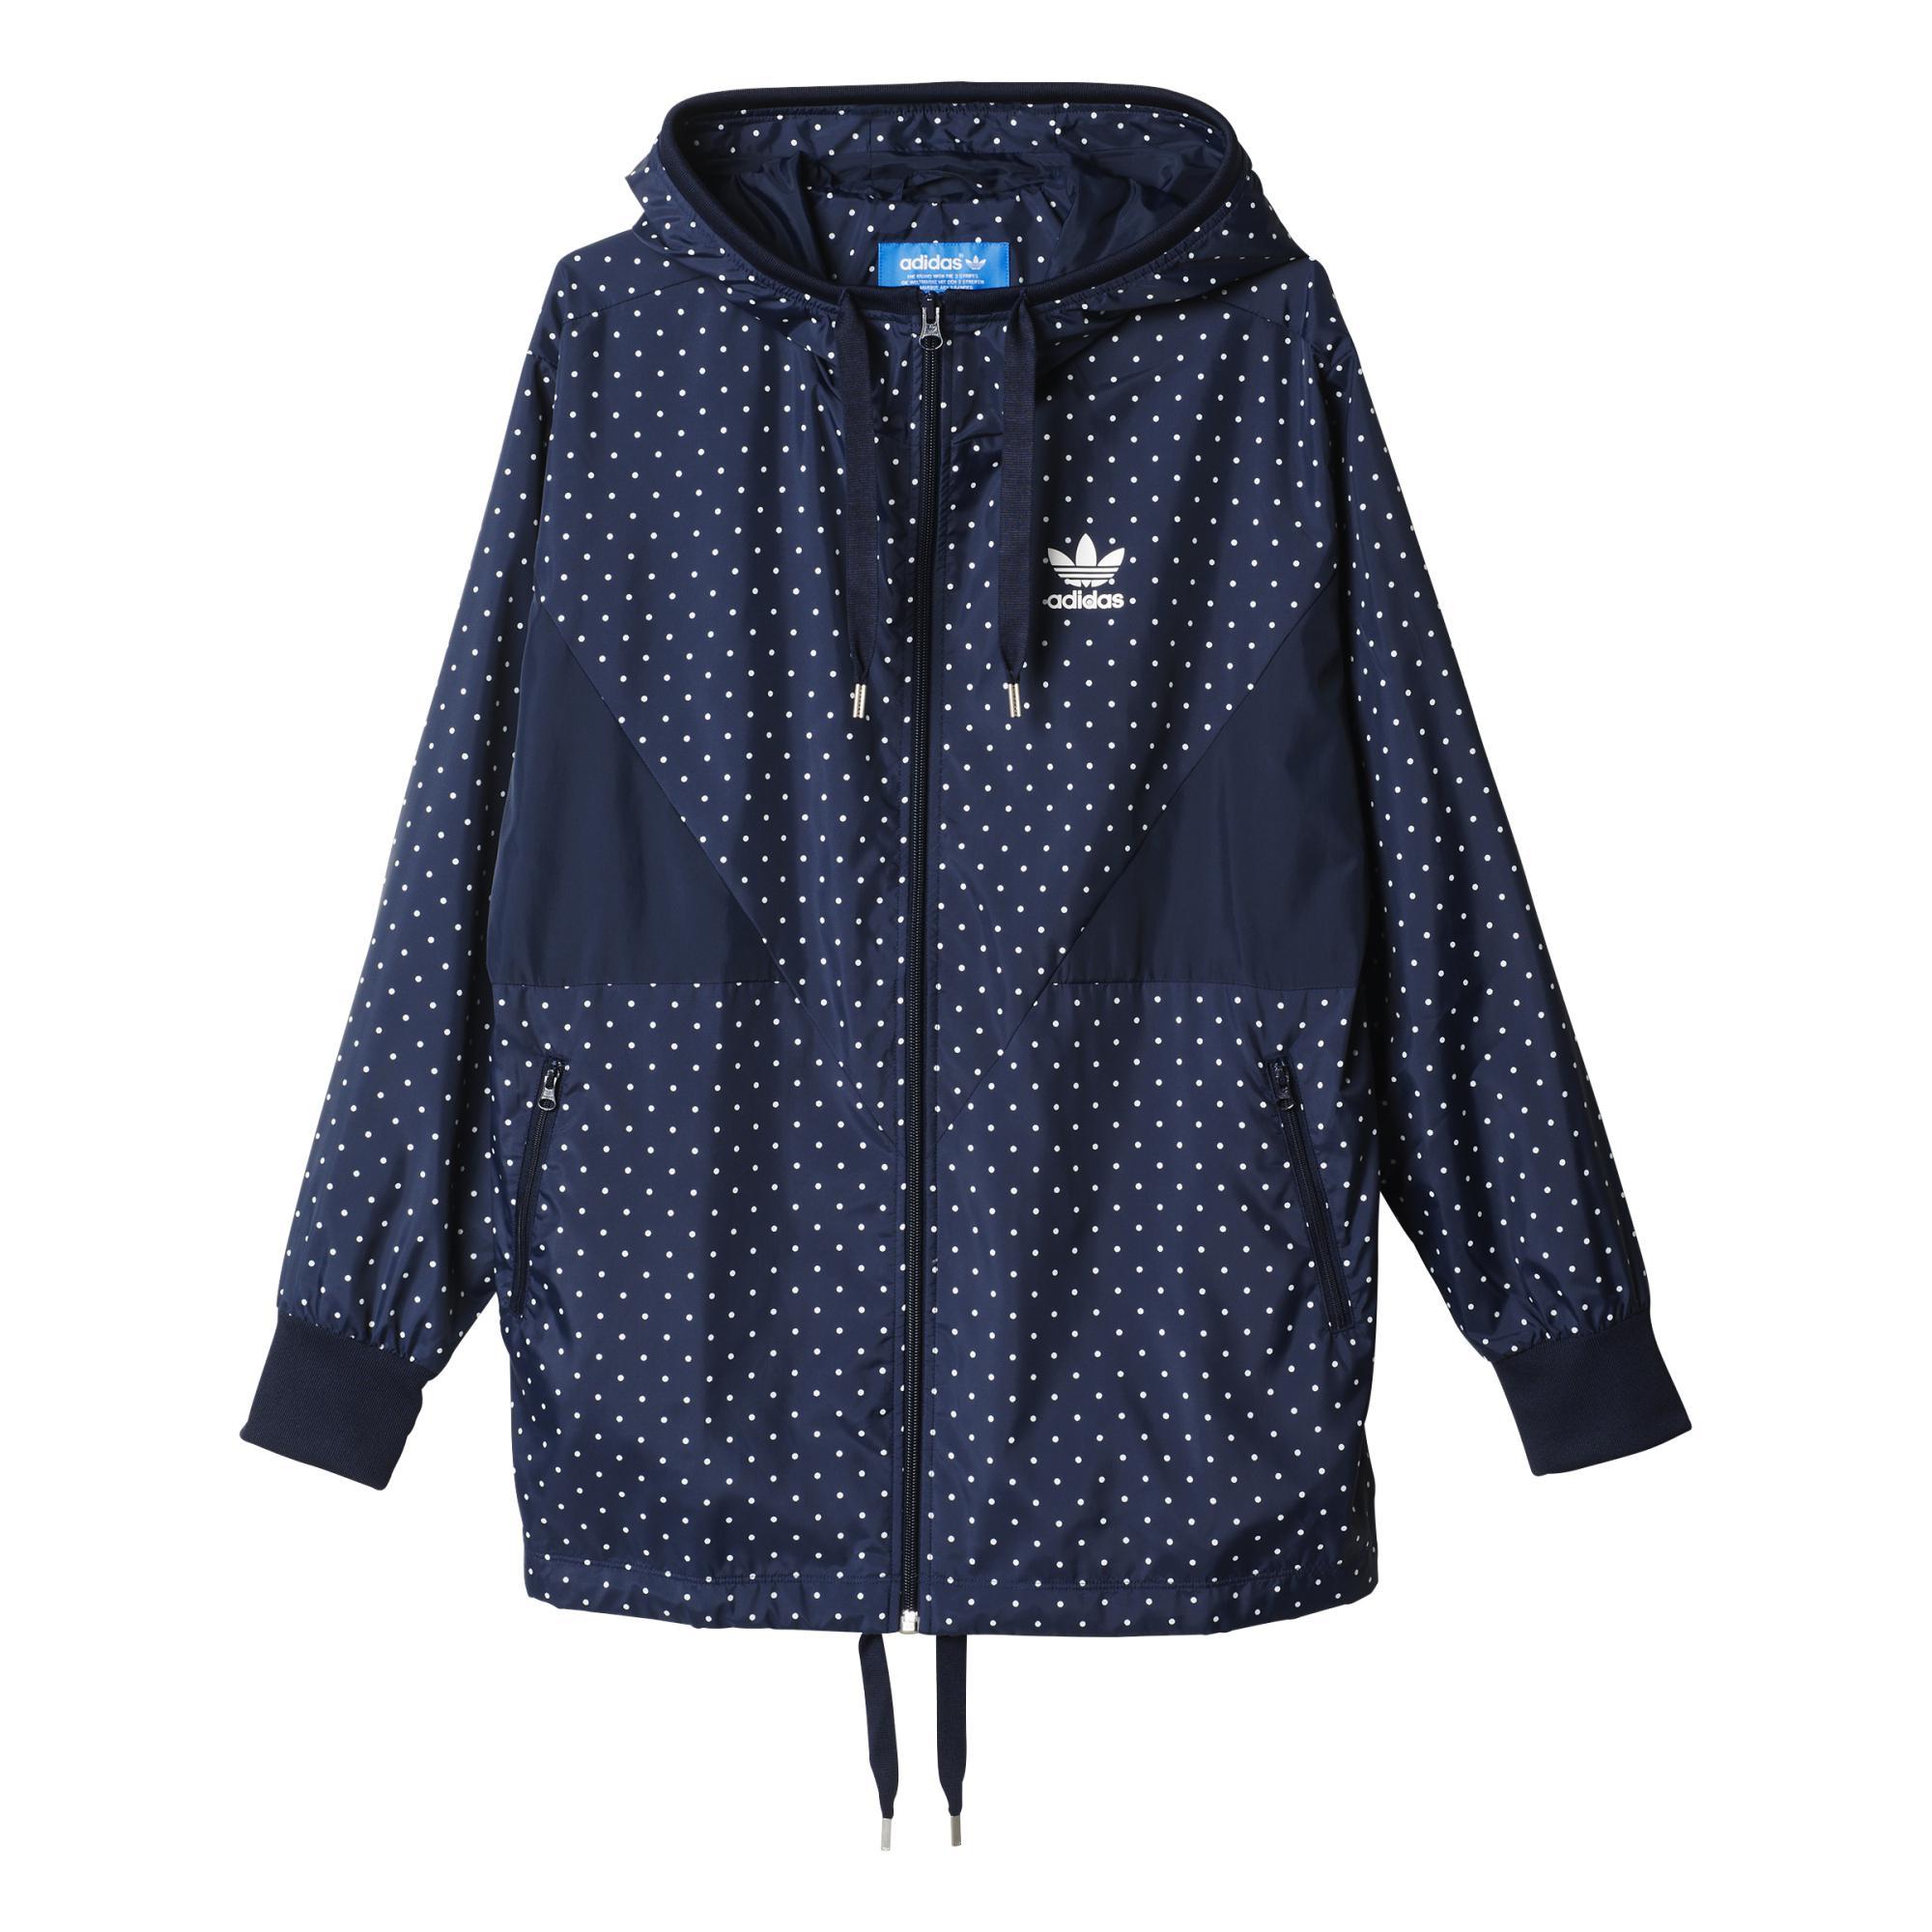 chaquetas adidas de lunares